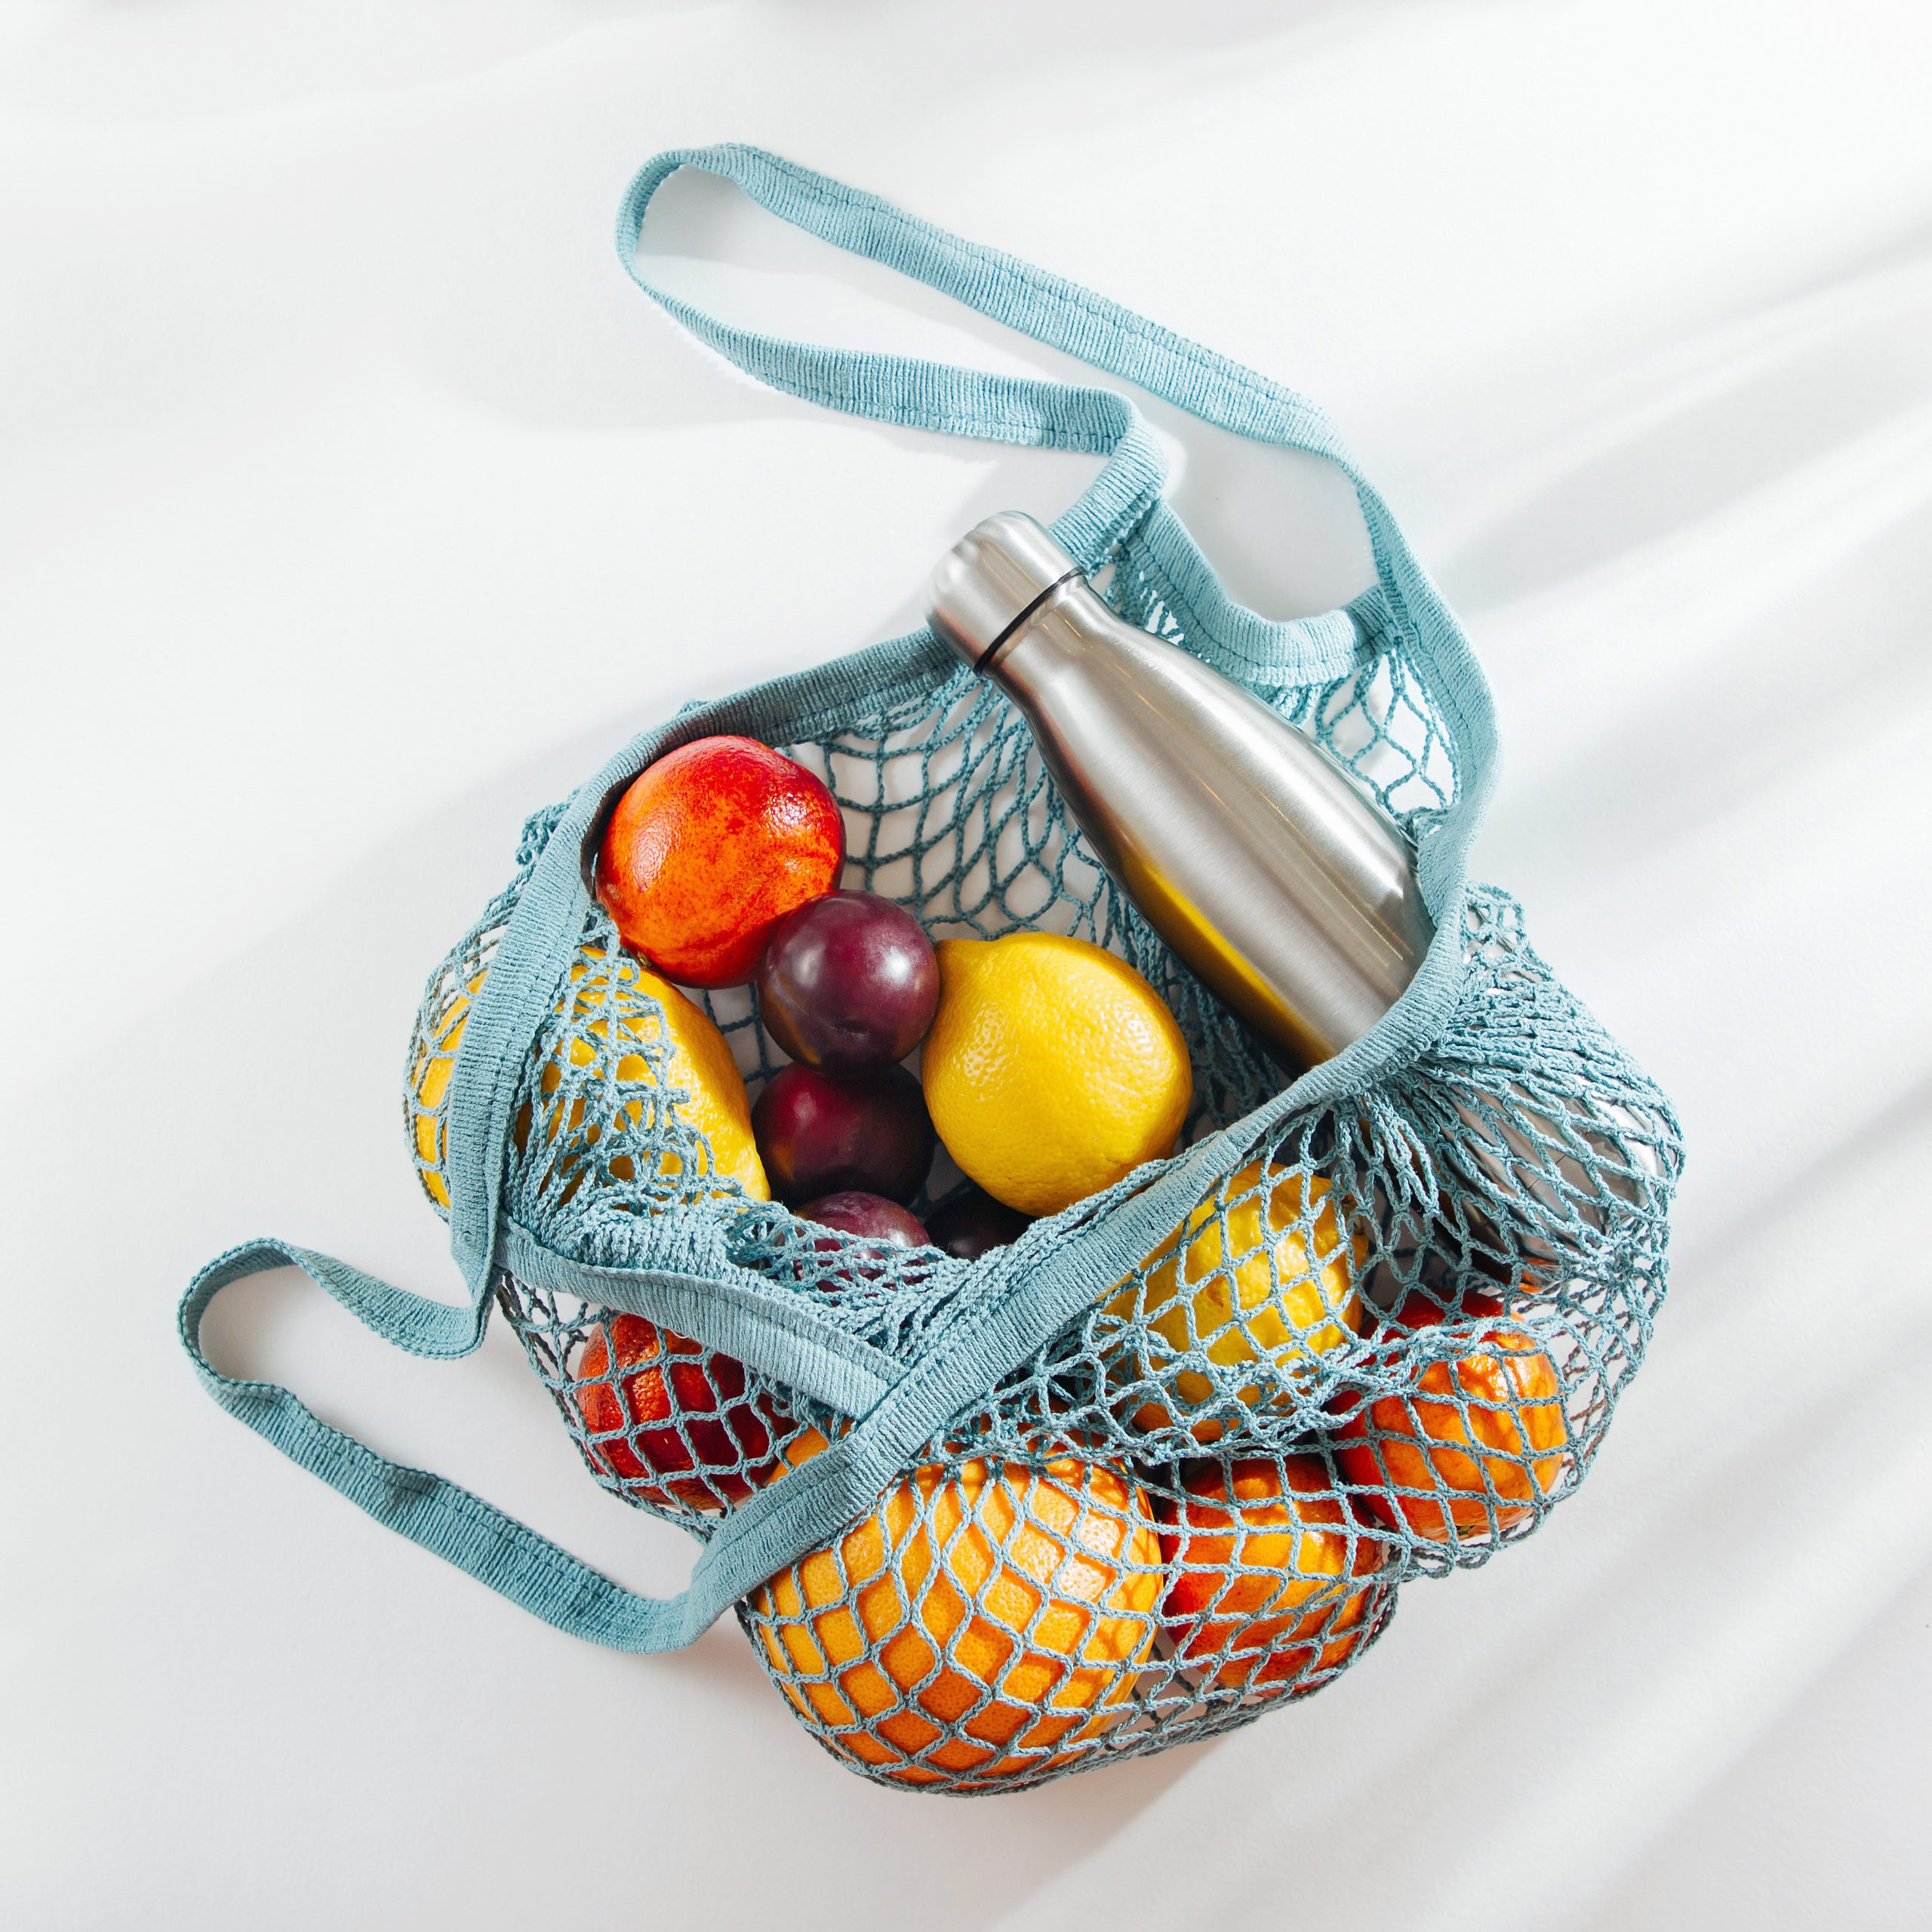 Reusable shopping bag for groceries